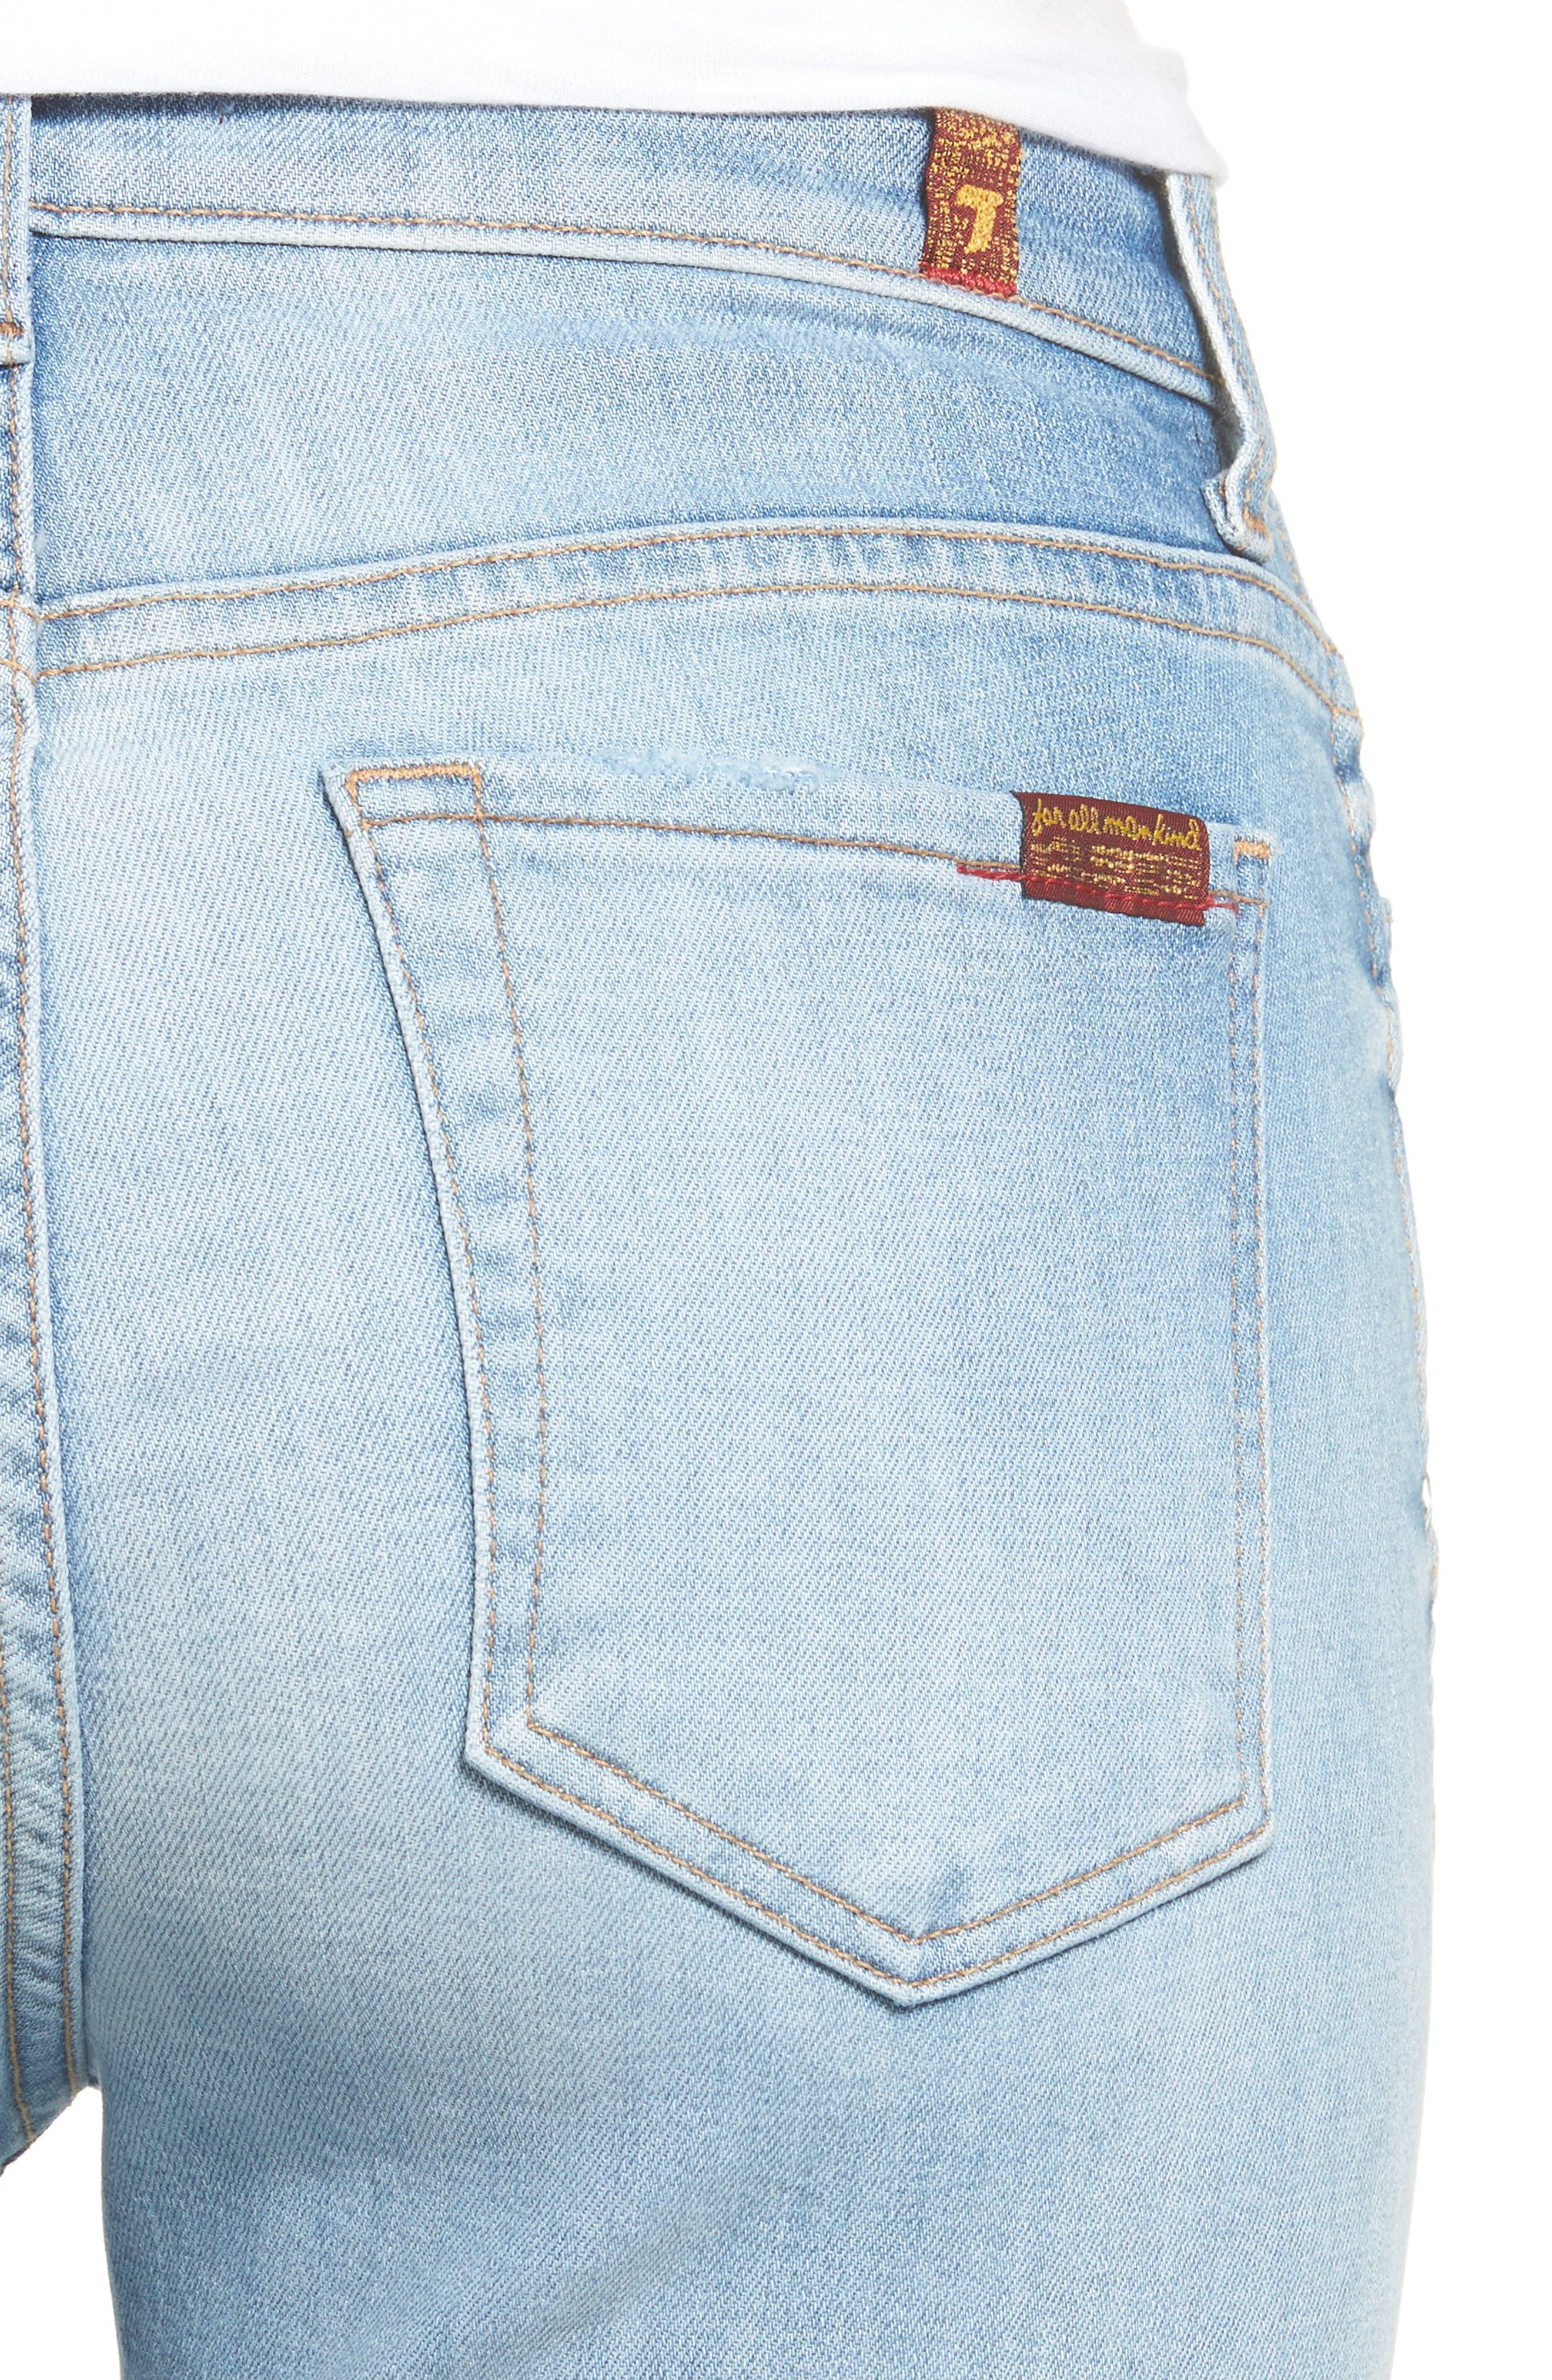 Edie High Waist Crop Jeans,                             Alternate thumbnail 4, color,